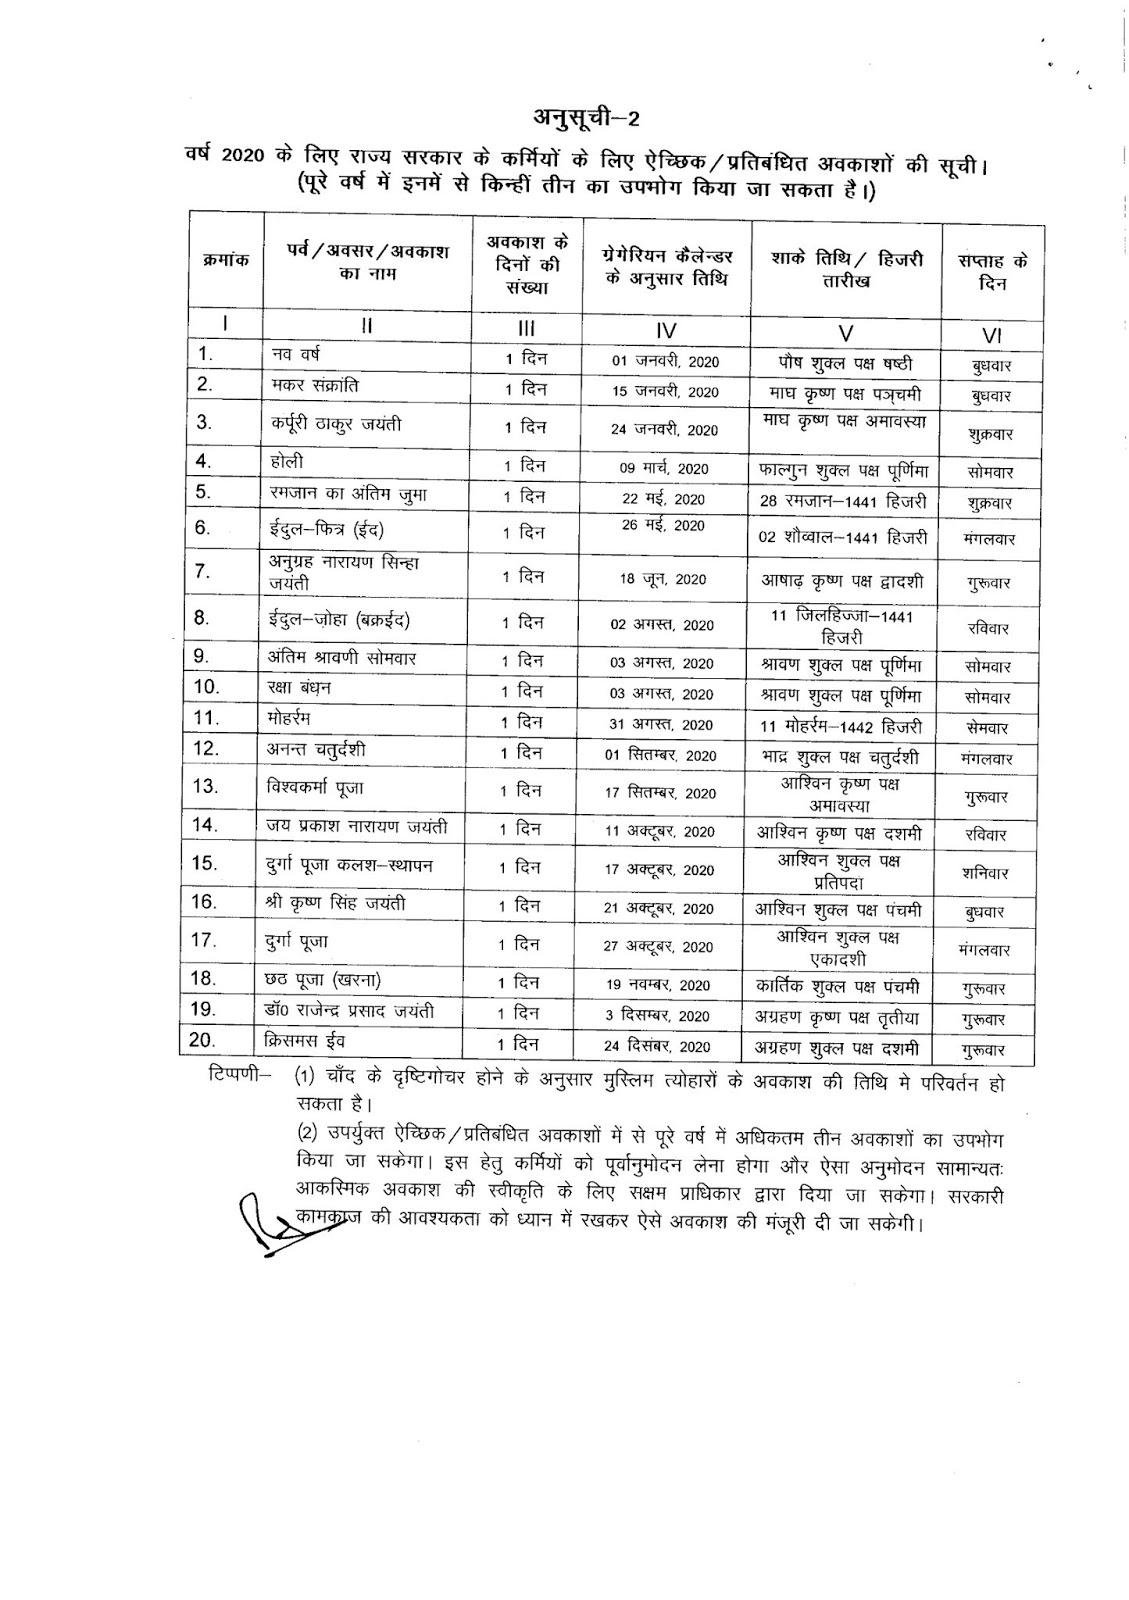 Bihar Government Calendar 2020 #educratsweb within Bihar Government Holiday Calendar 2020